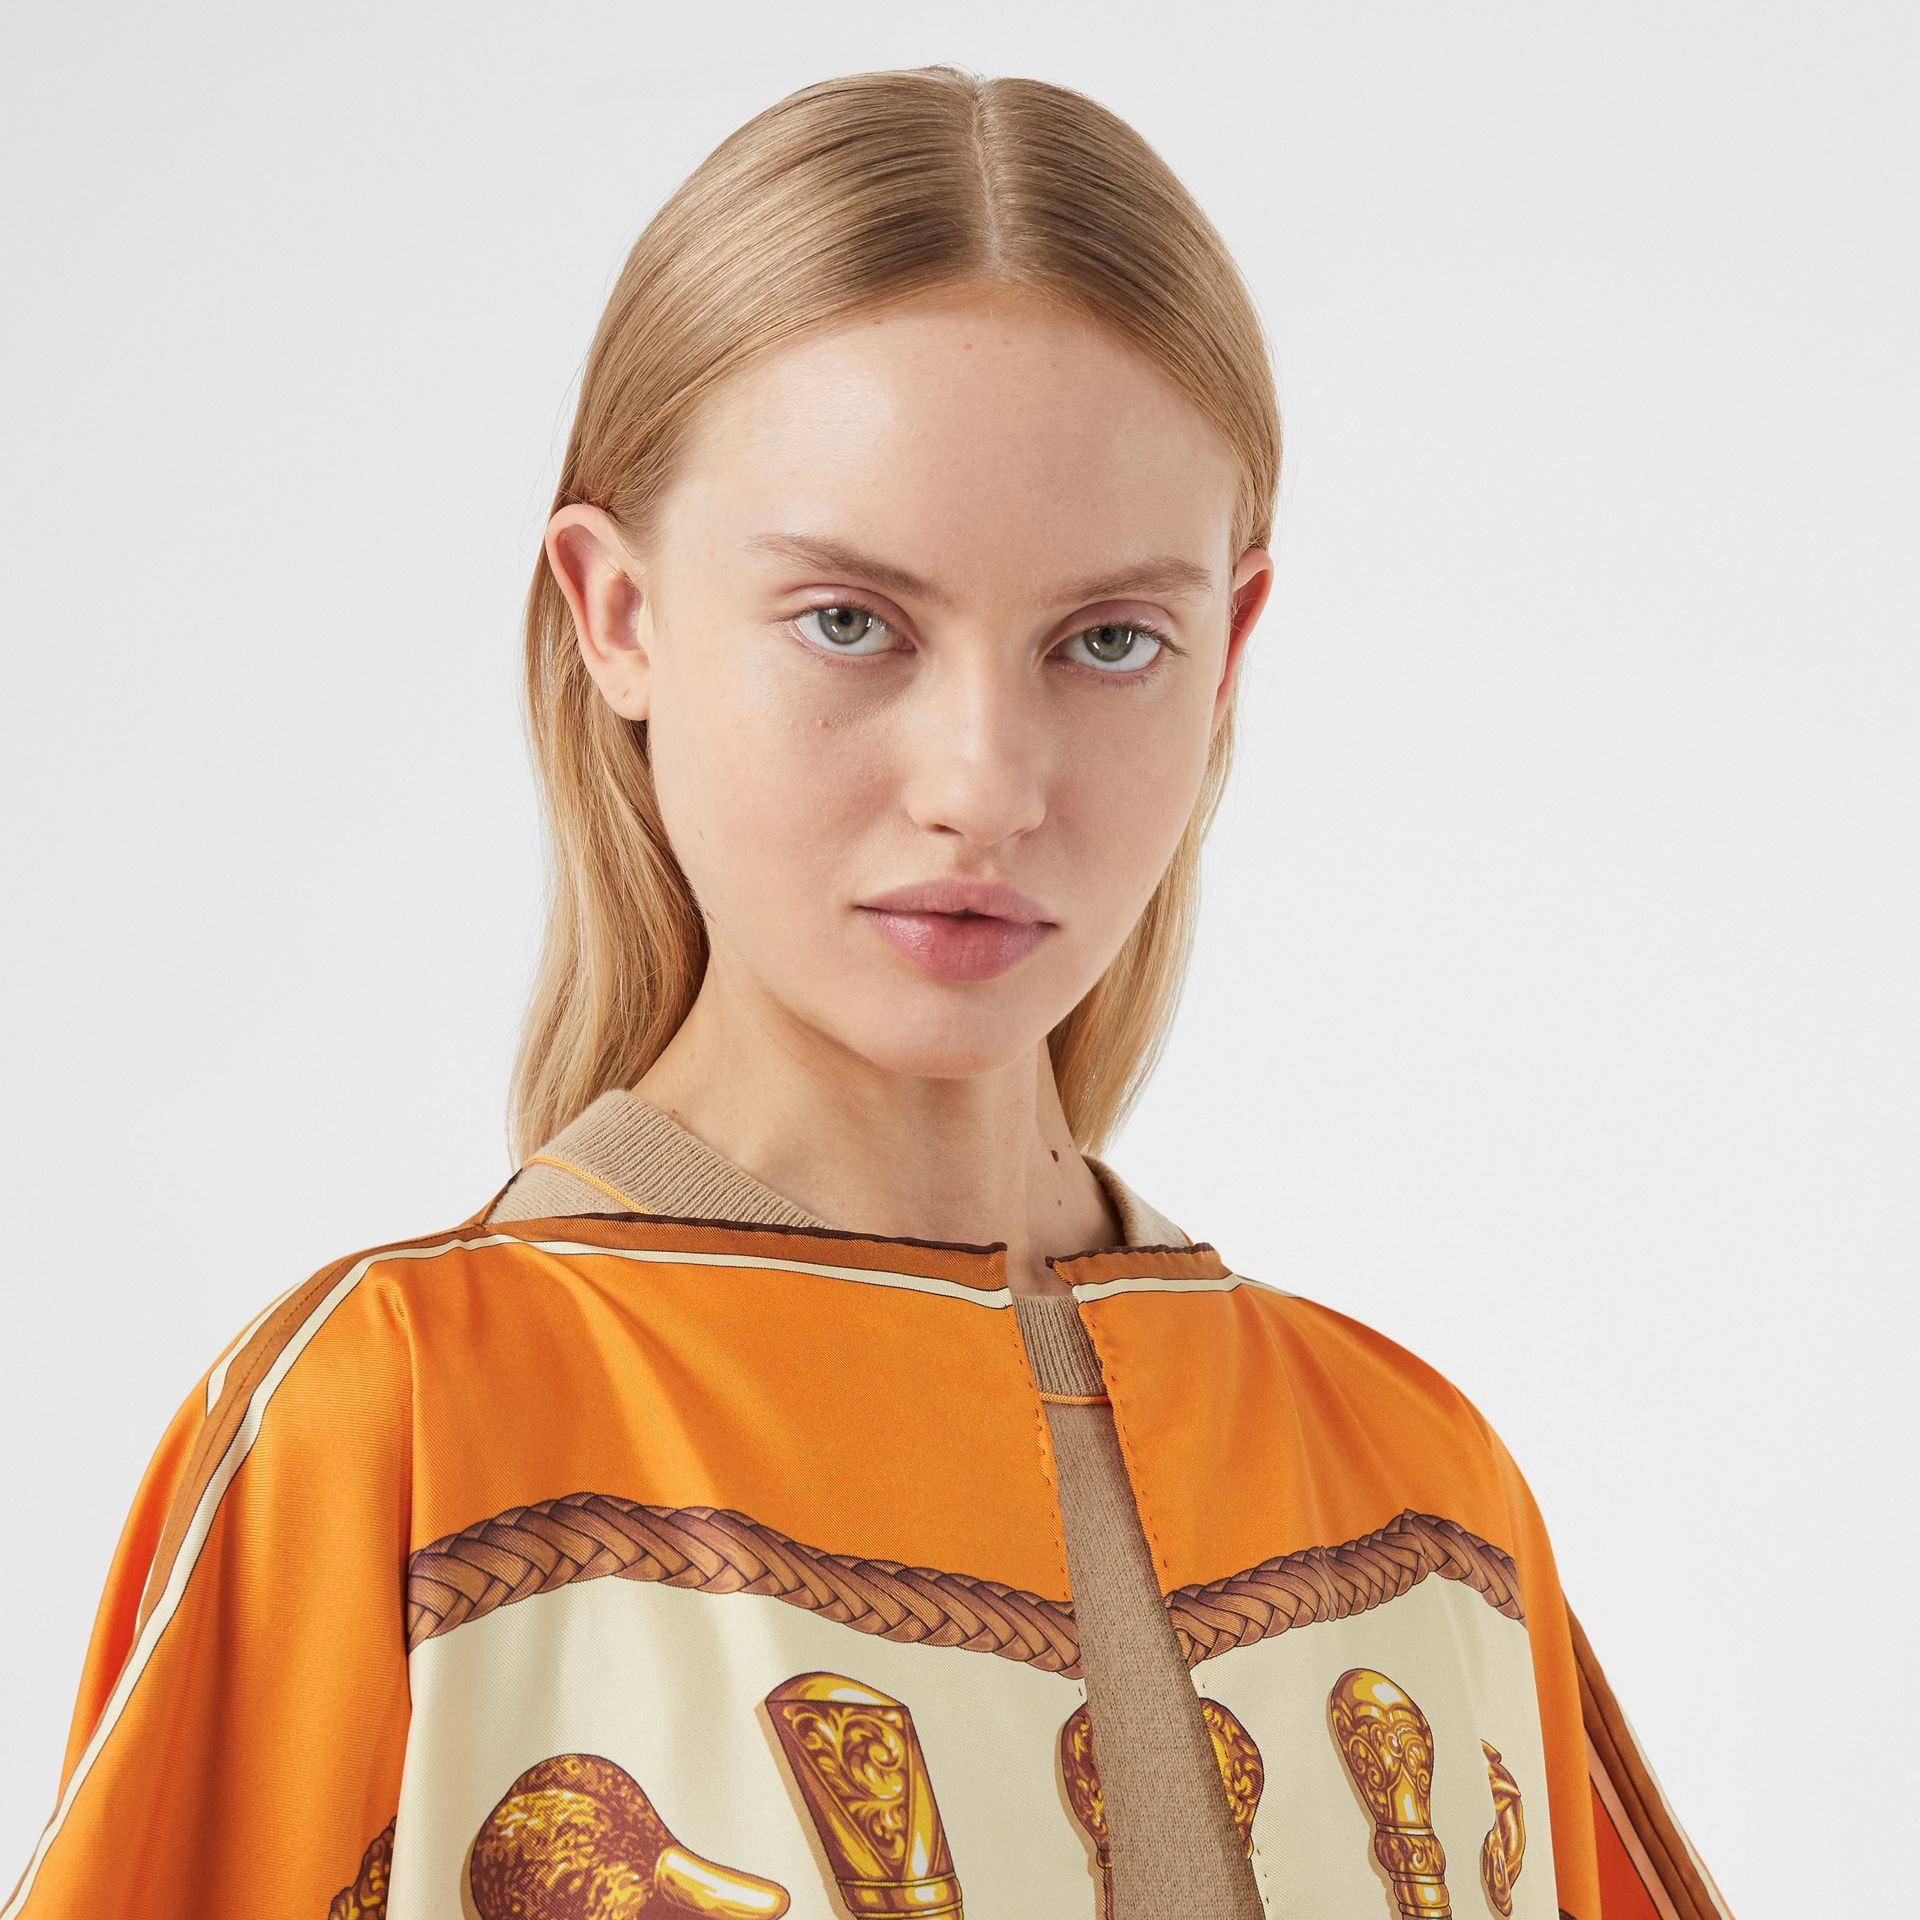 Archive Scarf Print Silk Twill Cape in Bright Orange - Women | Burberry - gallery image 1